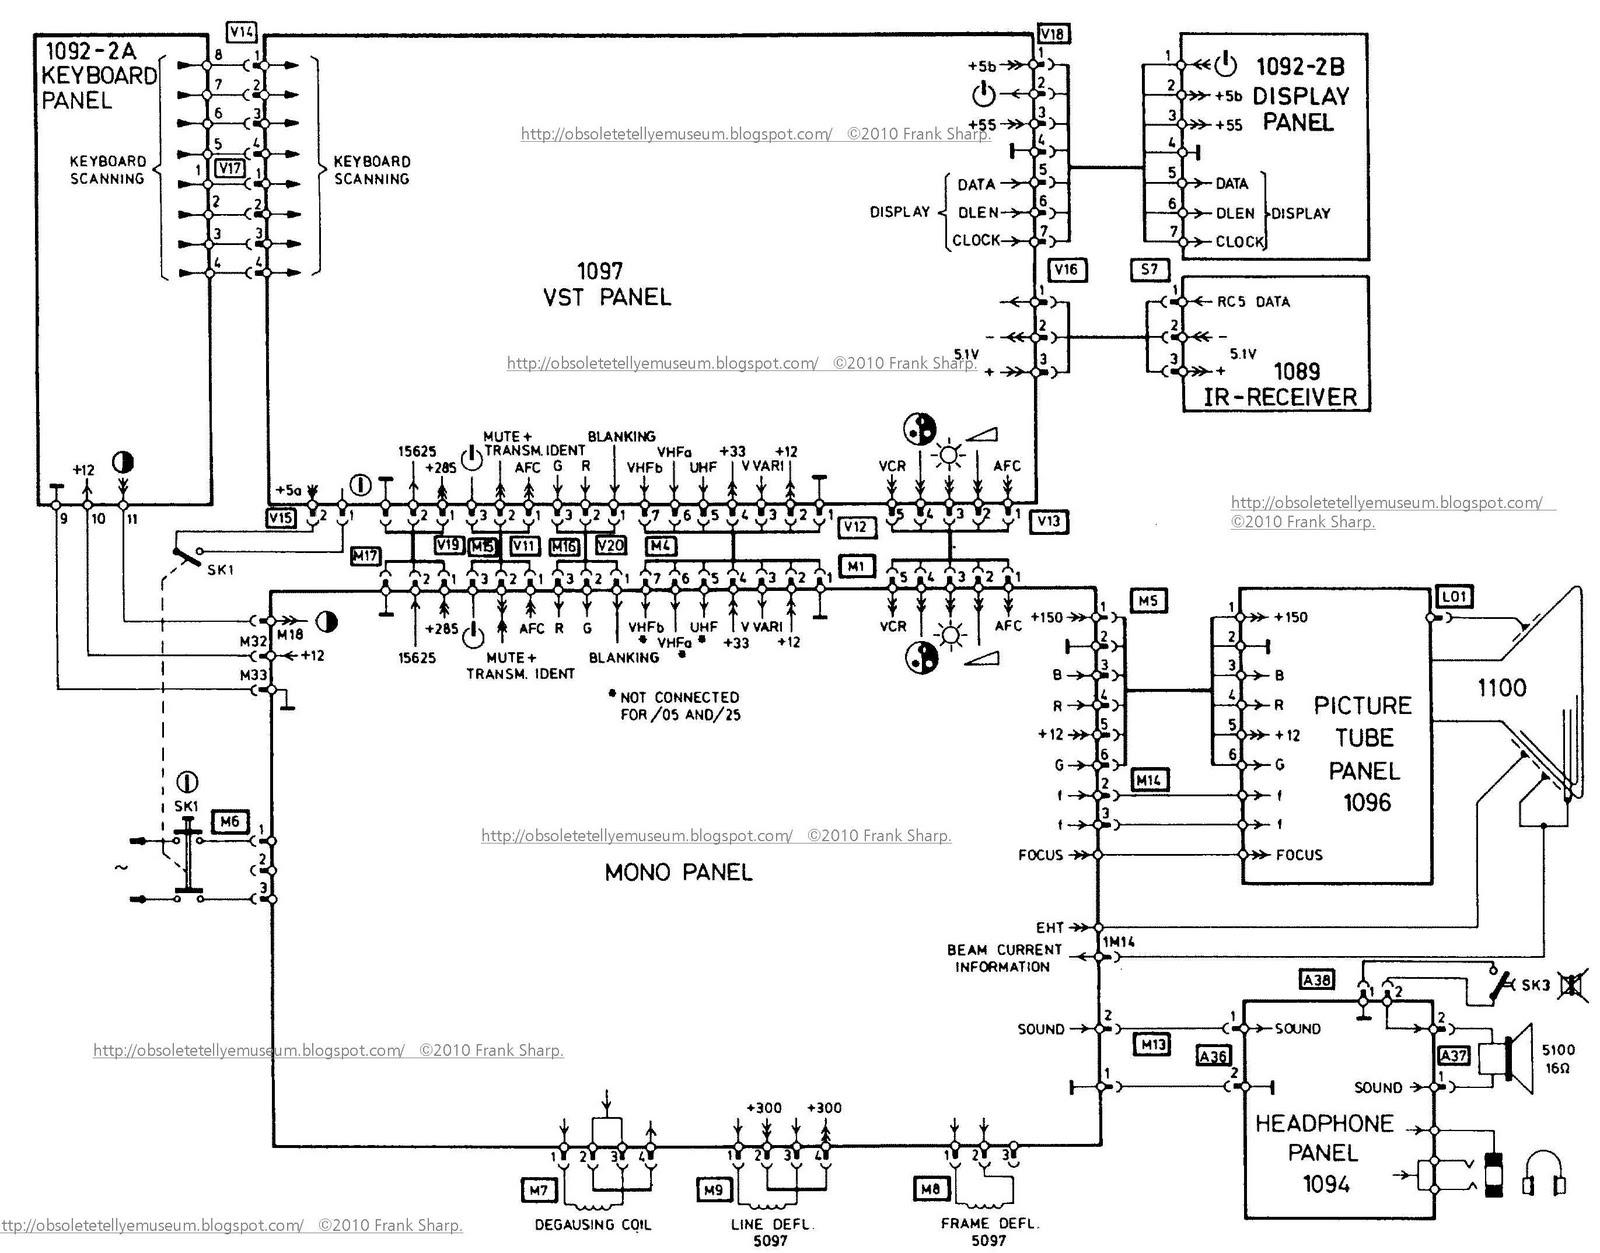 sony kv-1484mt инструкция